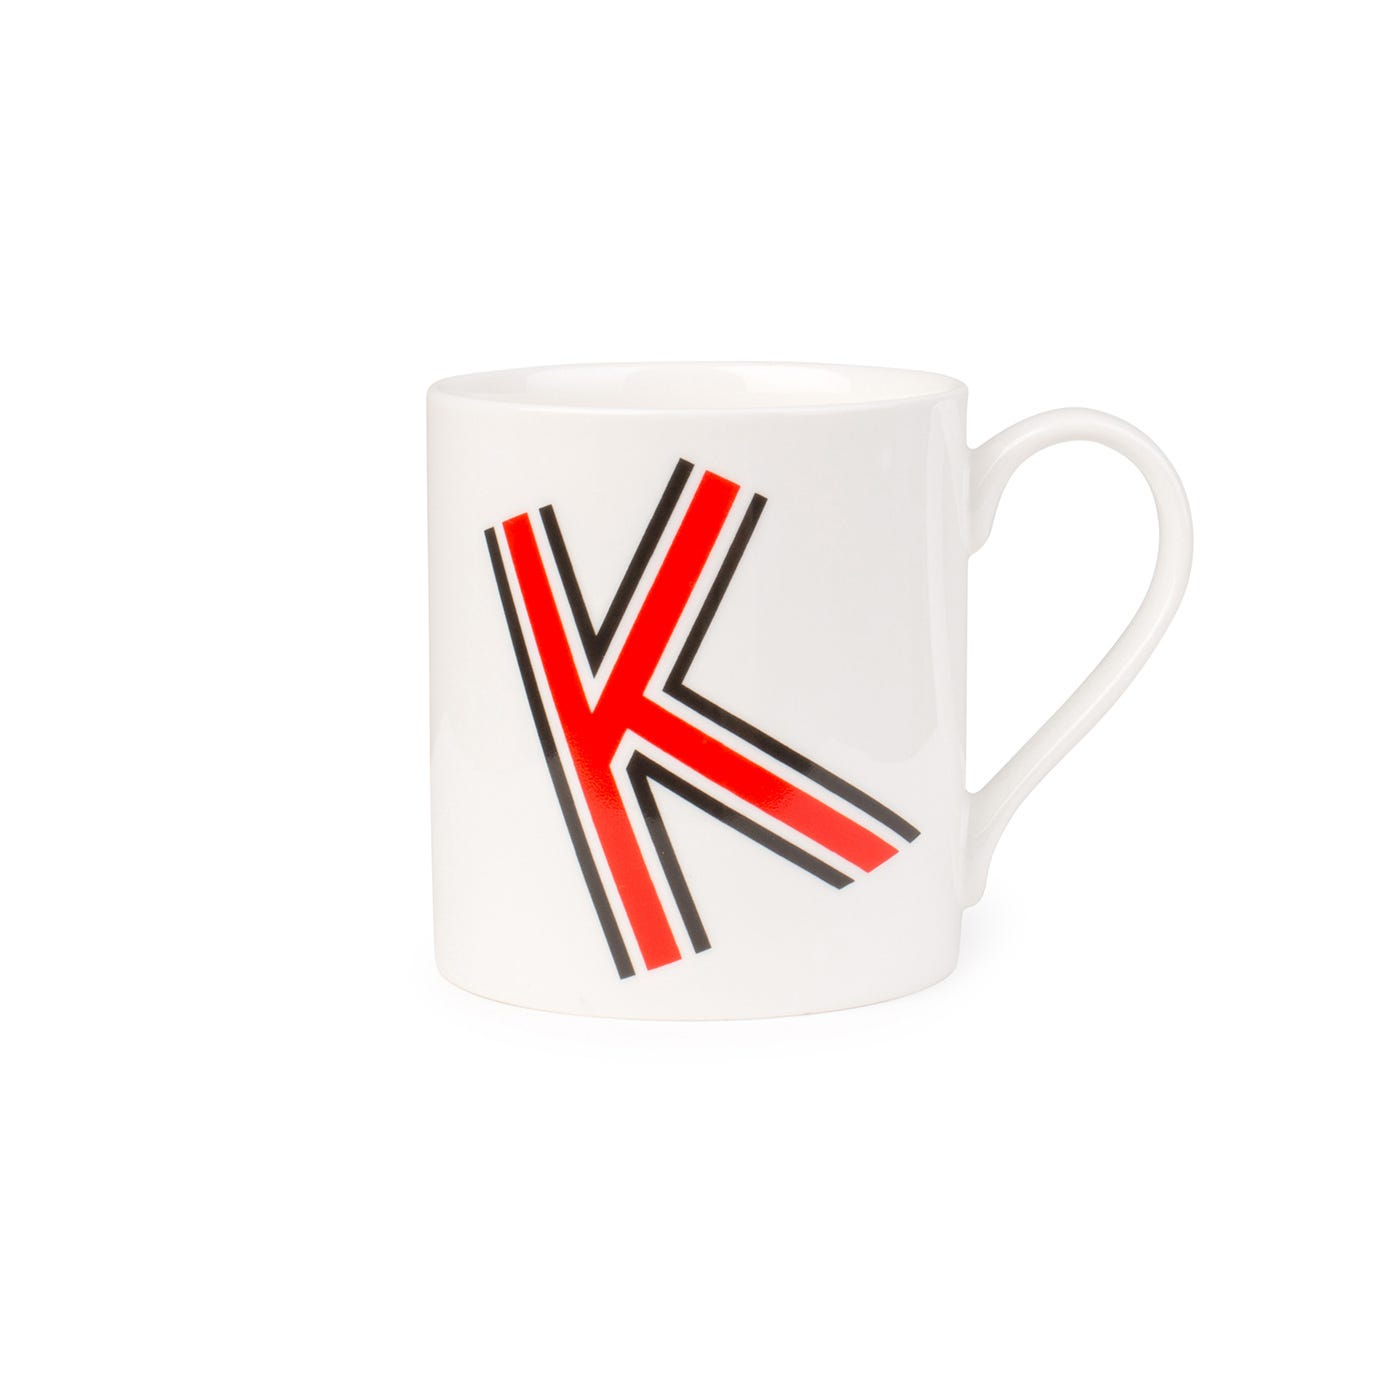 Heal's Heal's Heritage Alphabet Mug K